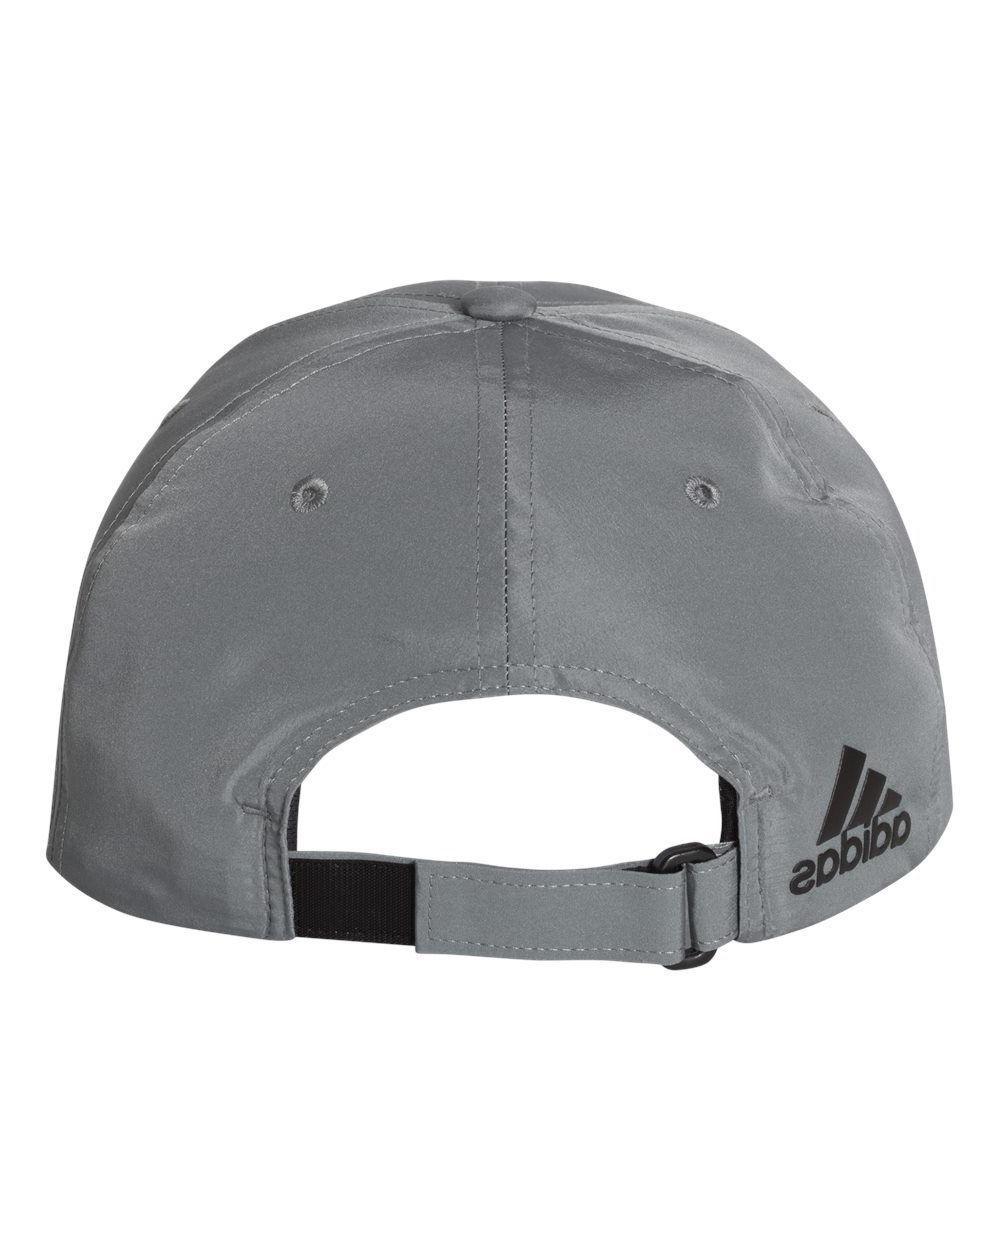 ADIDAS Adjustable HAT, Men's Performance